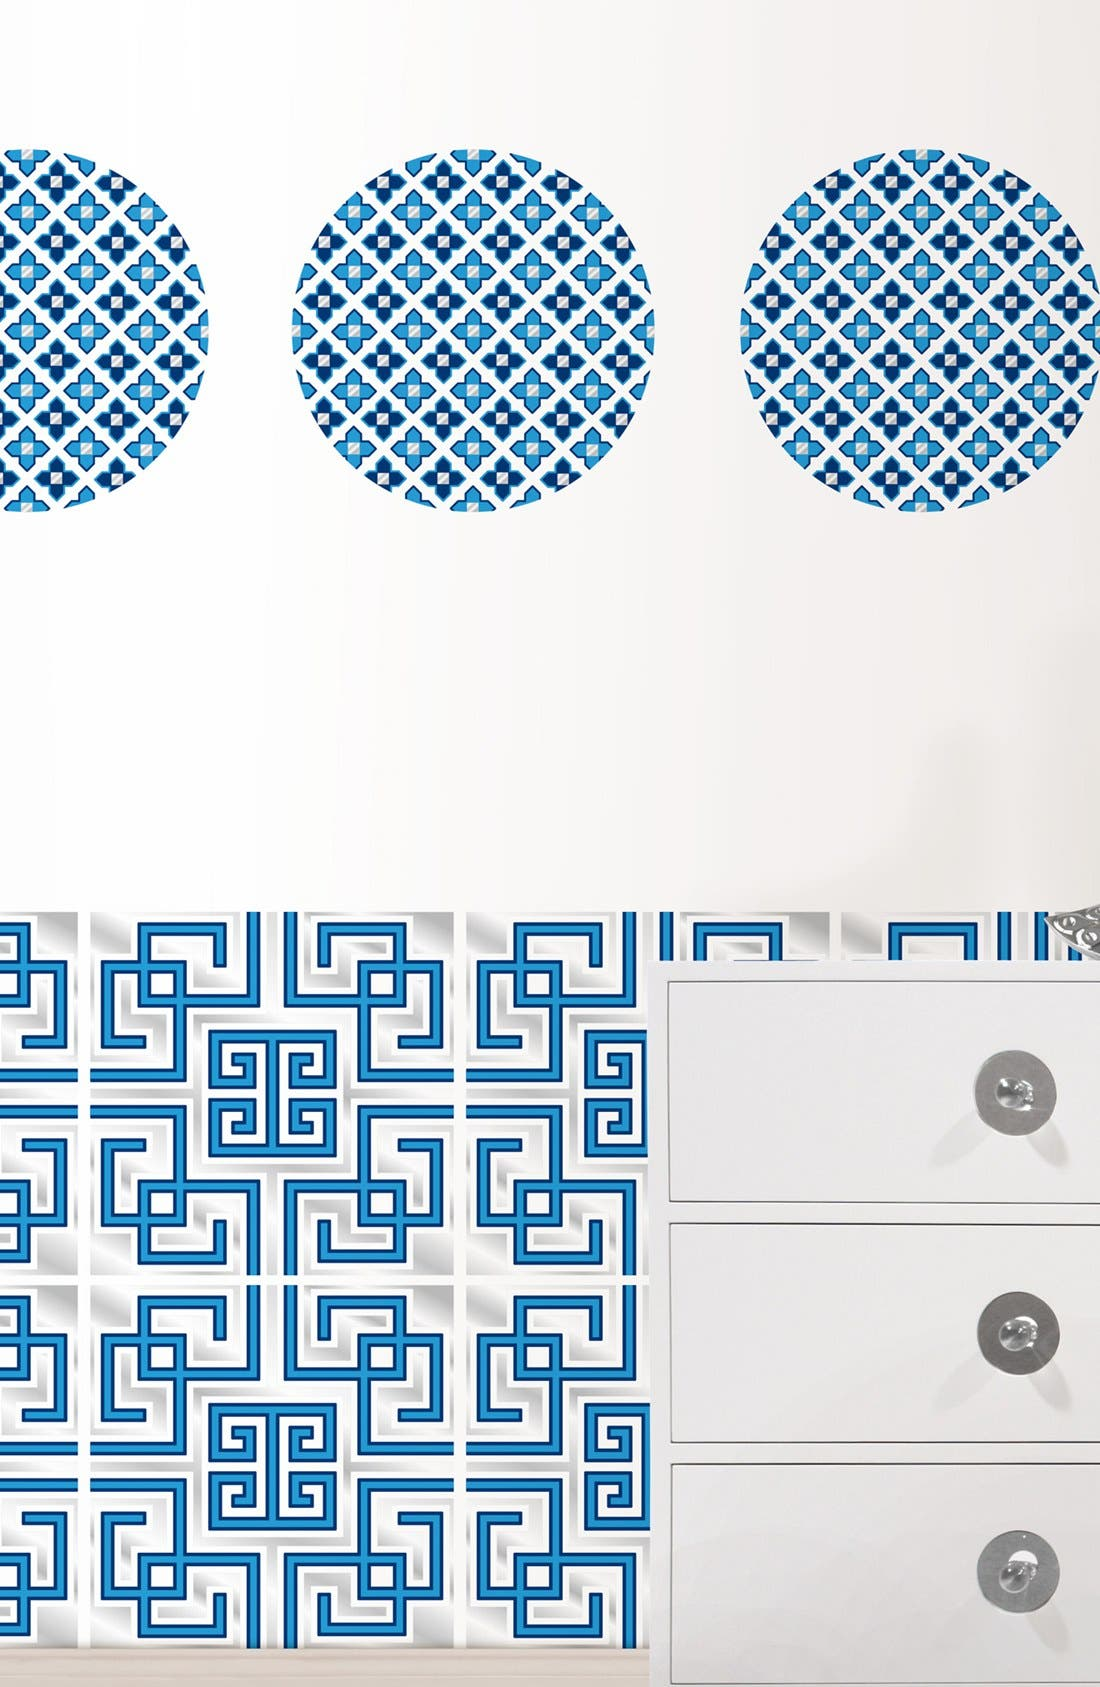 Alternate Image 1 Selected - Wallpops 'Carnaby Dots & Blox' Wall Art